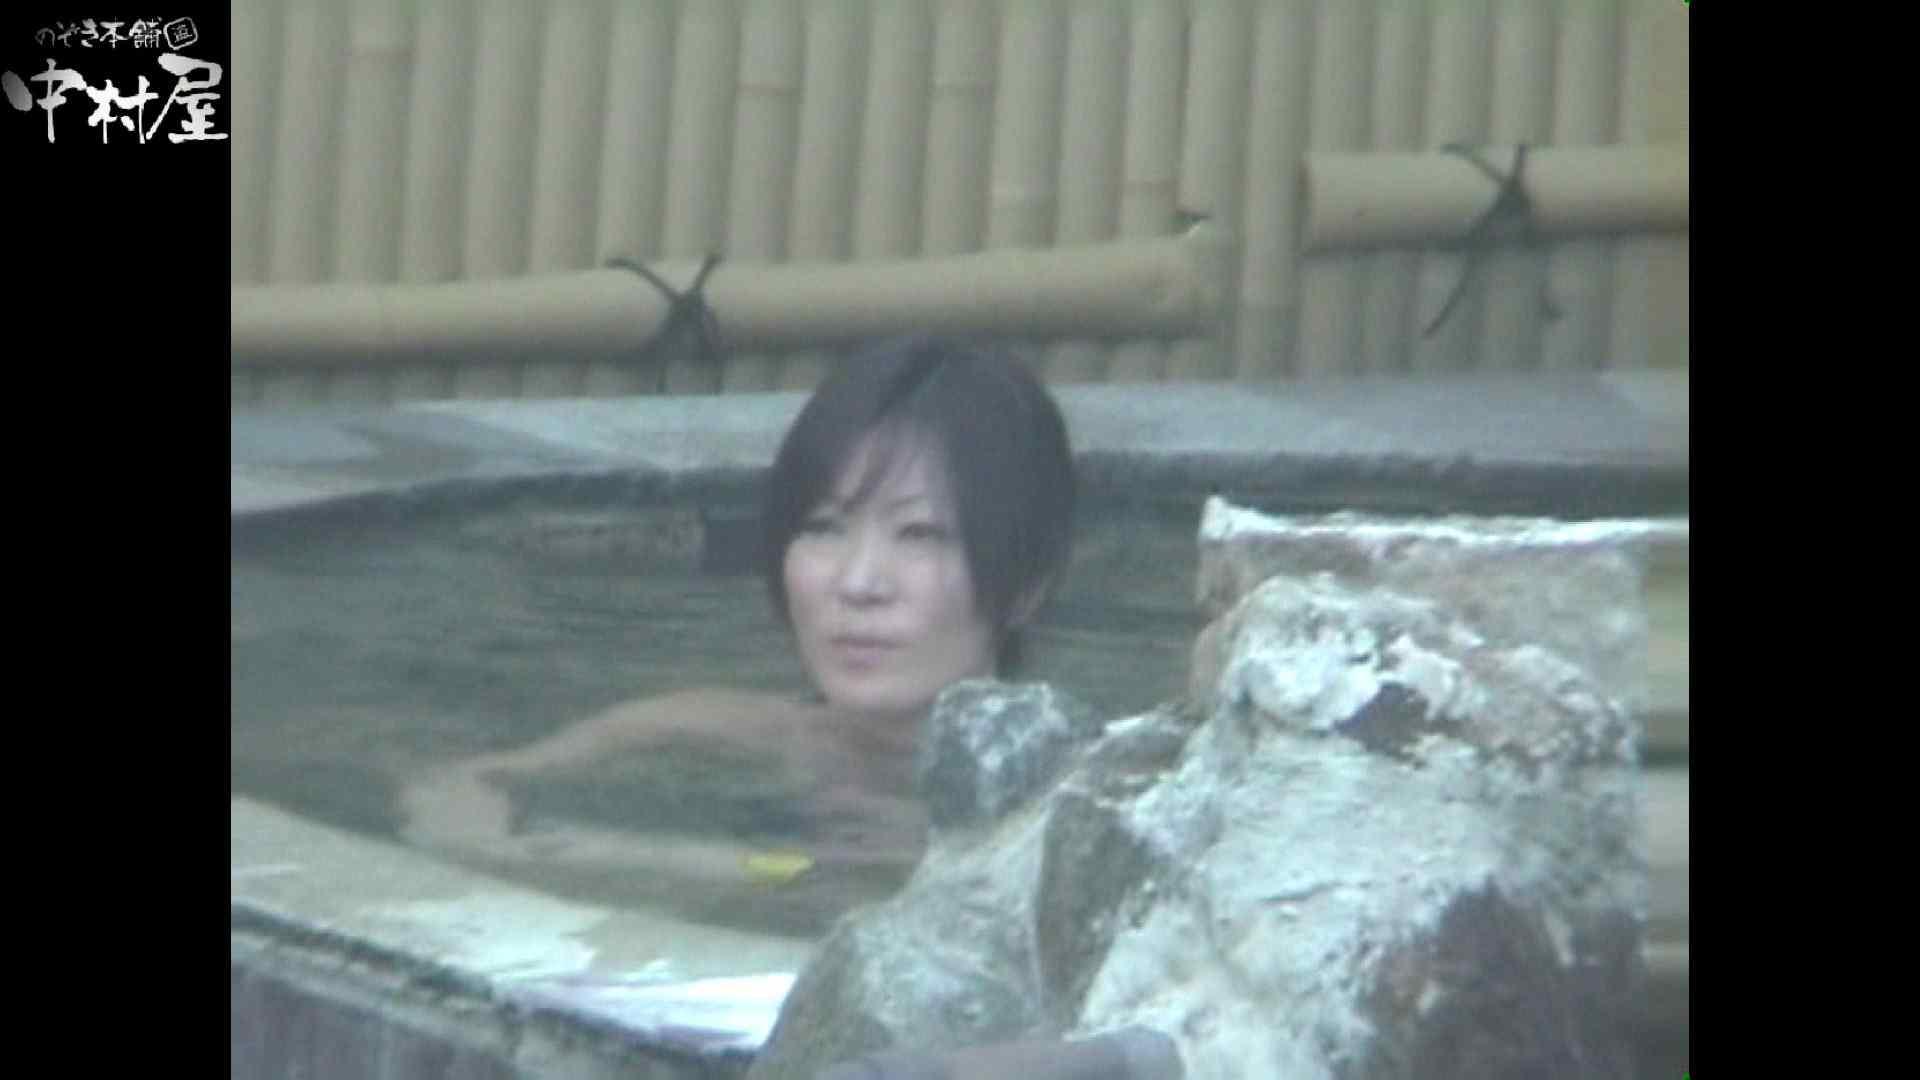 Aquaな露天風呂Vol.972 露天風呂 セックス無修正動画無料 105連発 5